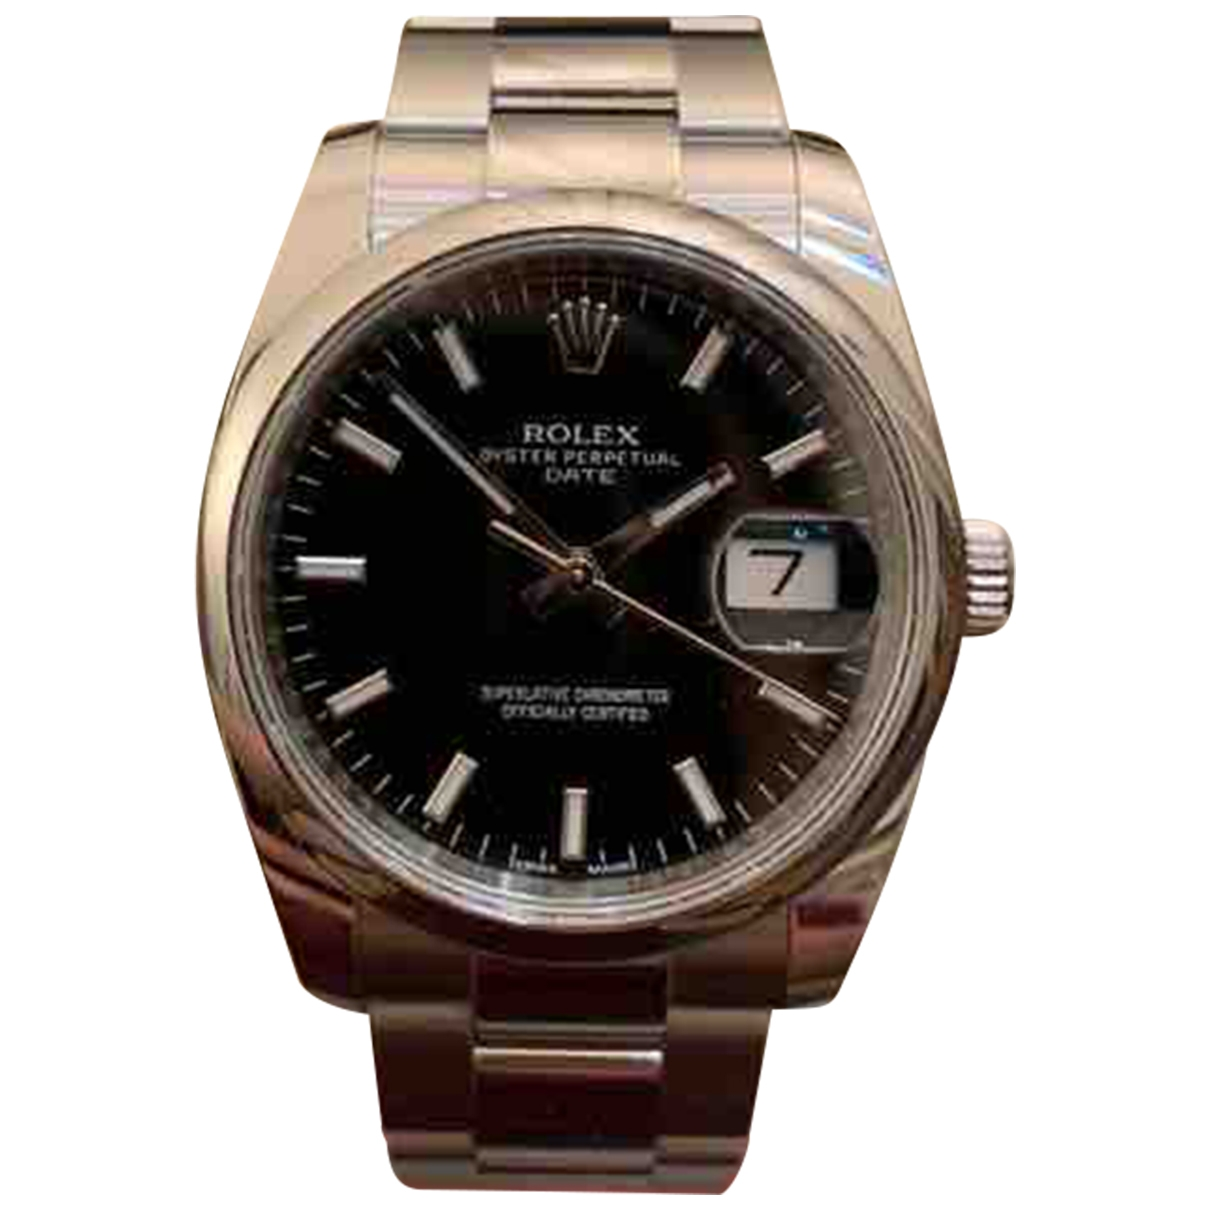 Reloj Oyster Perpetual 34mm Rolex